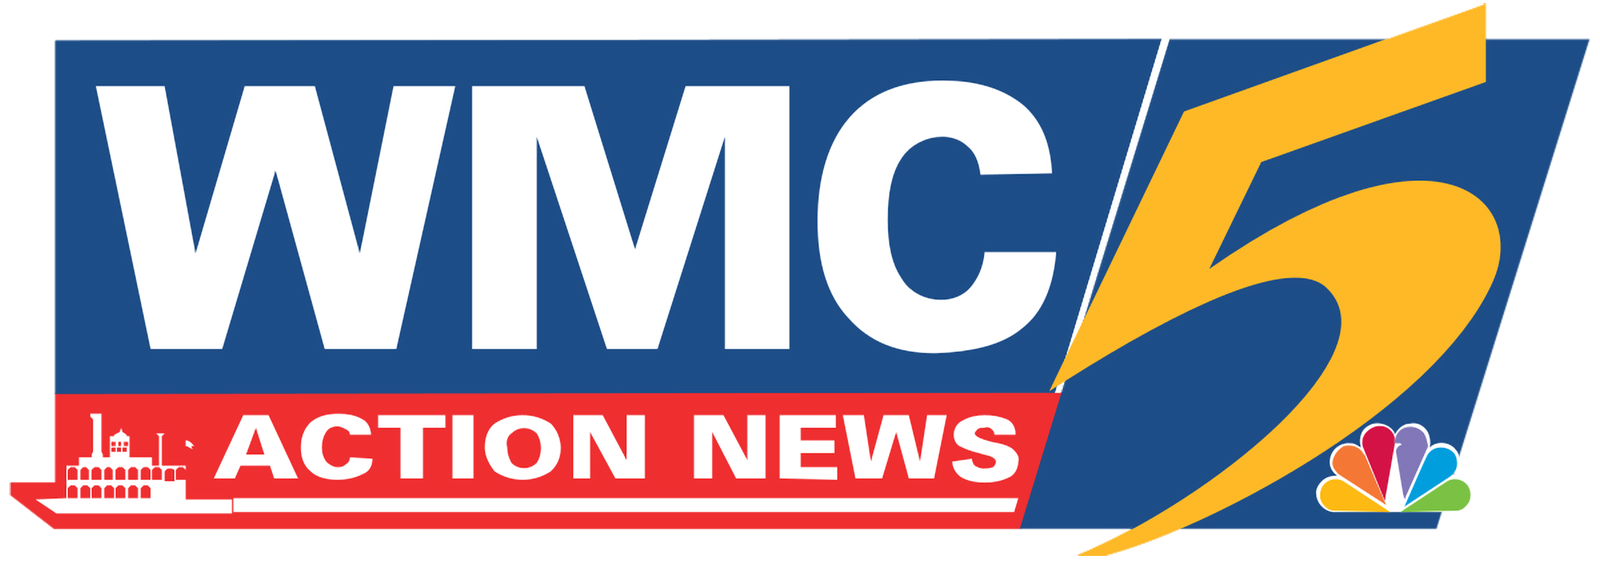 WMC Action News 5 Logo